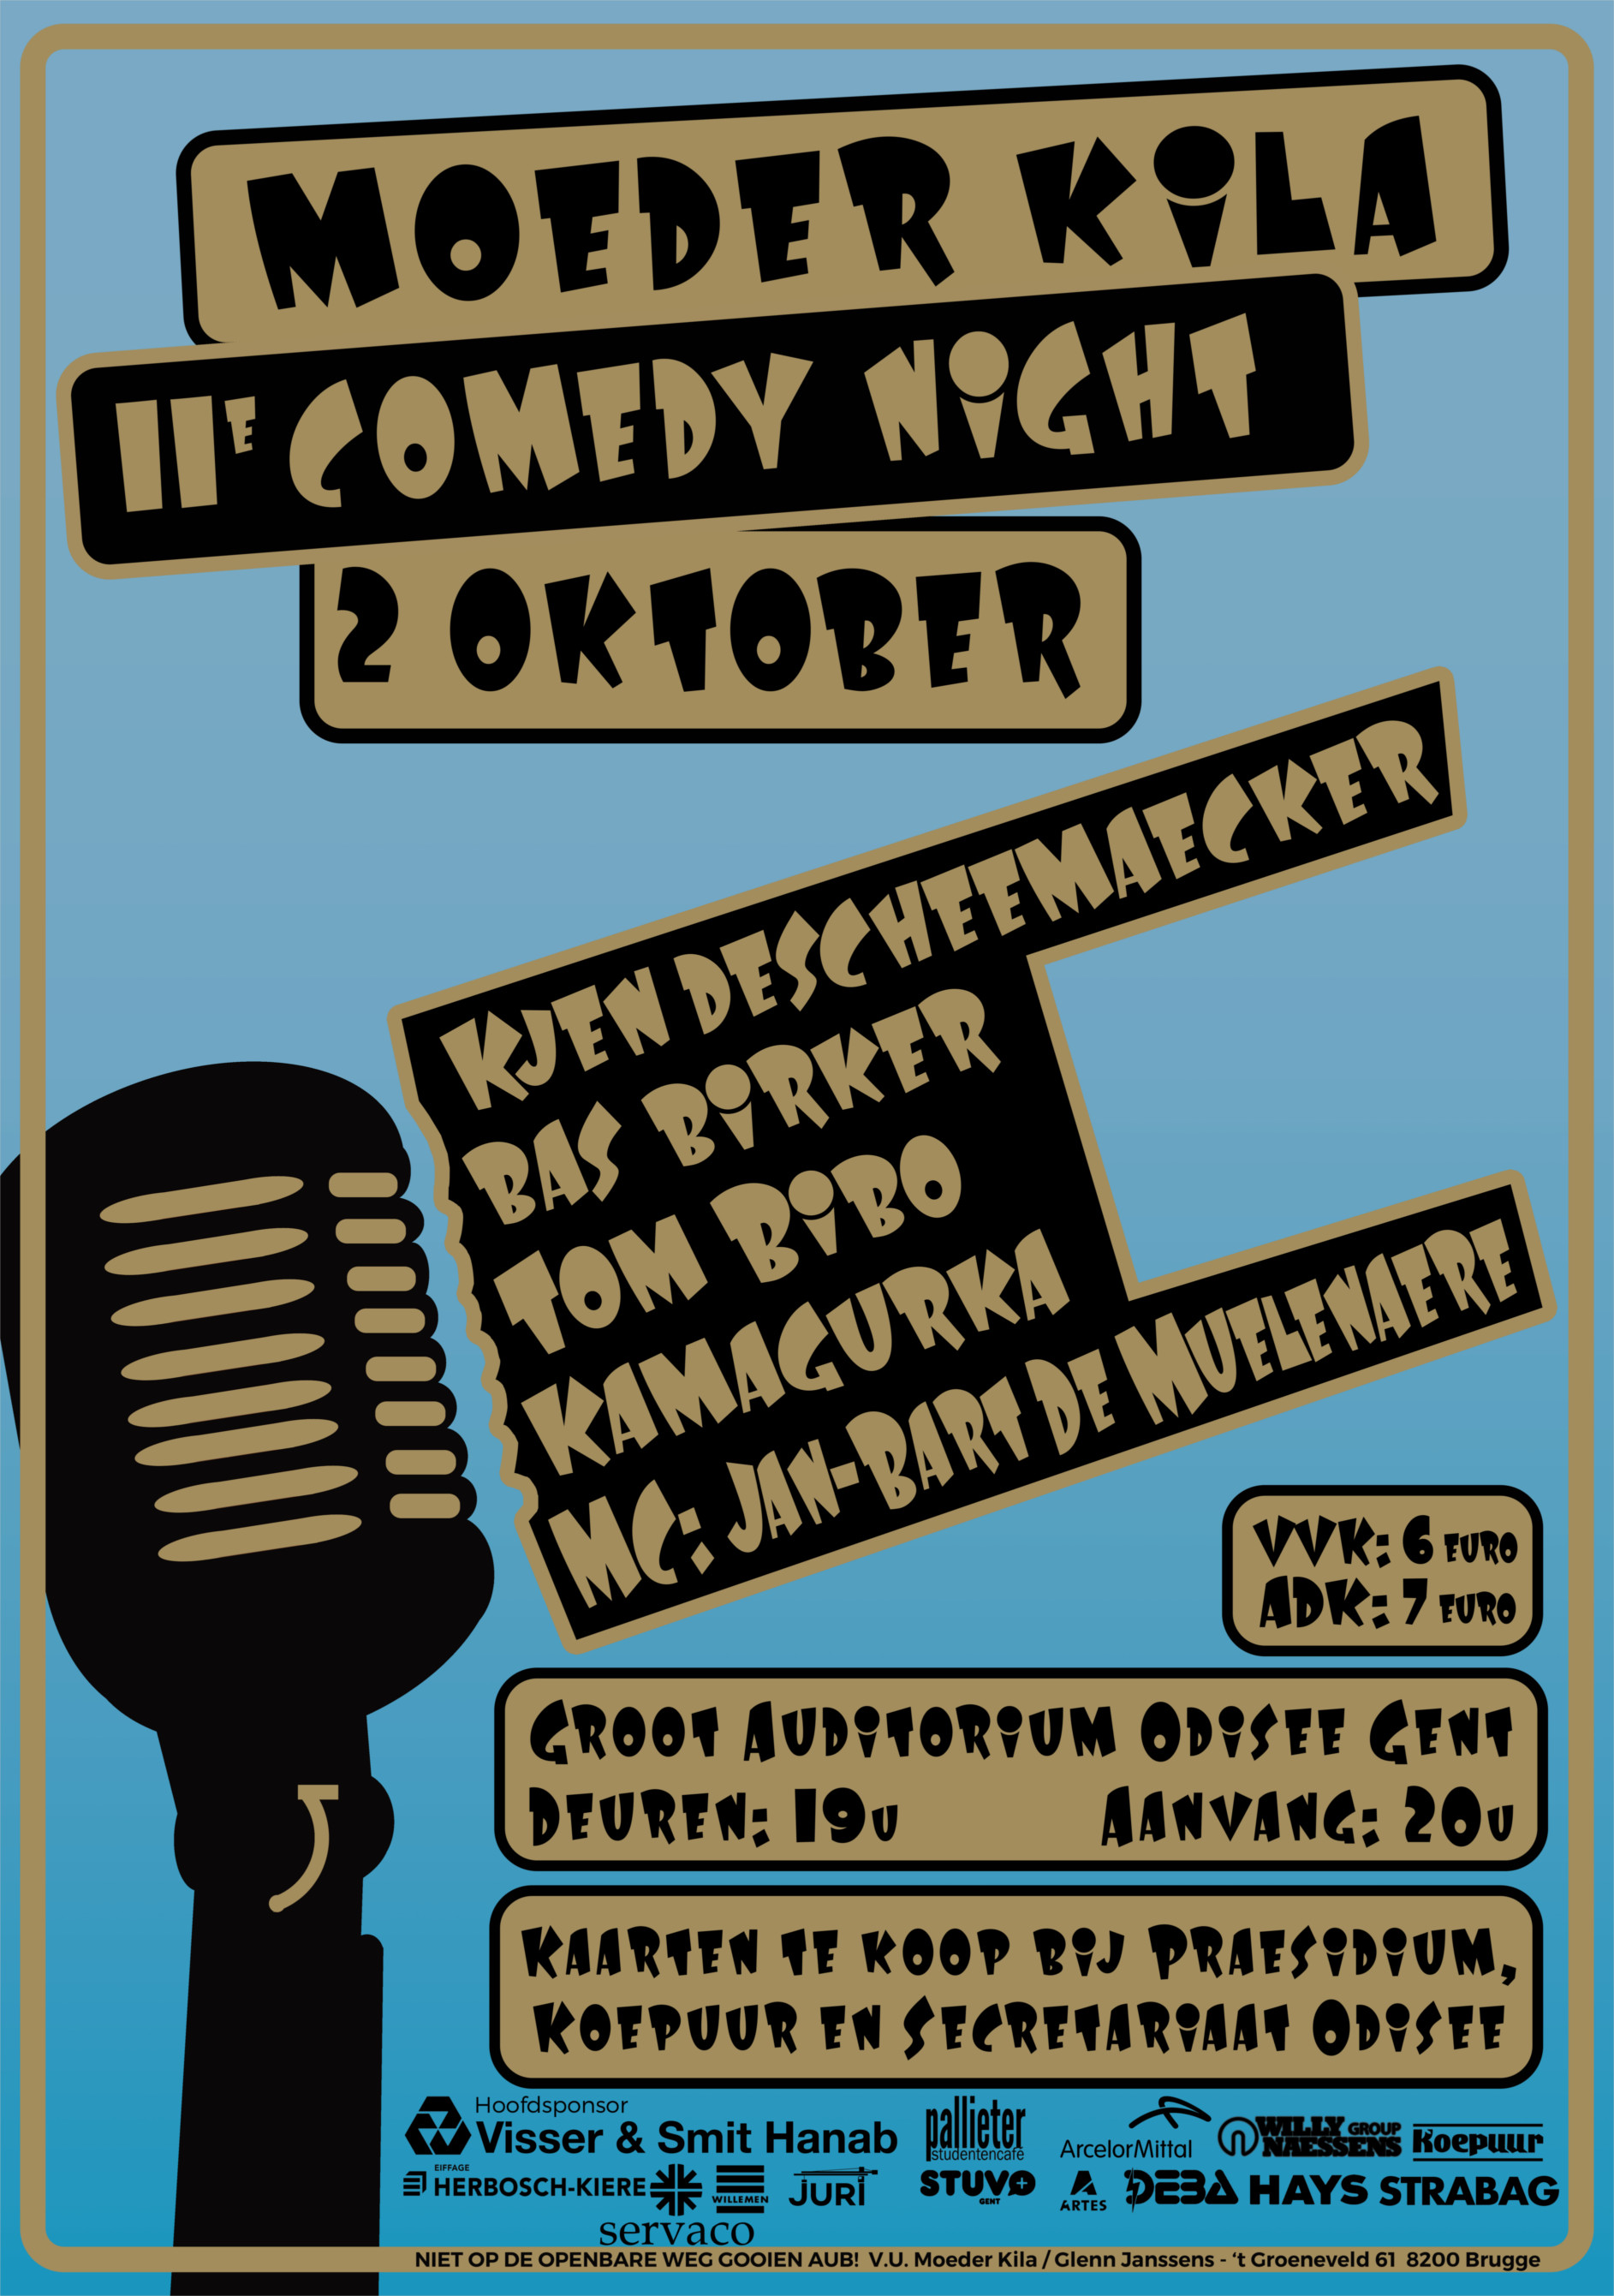 2017-10-02 - KILA Comedy 11